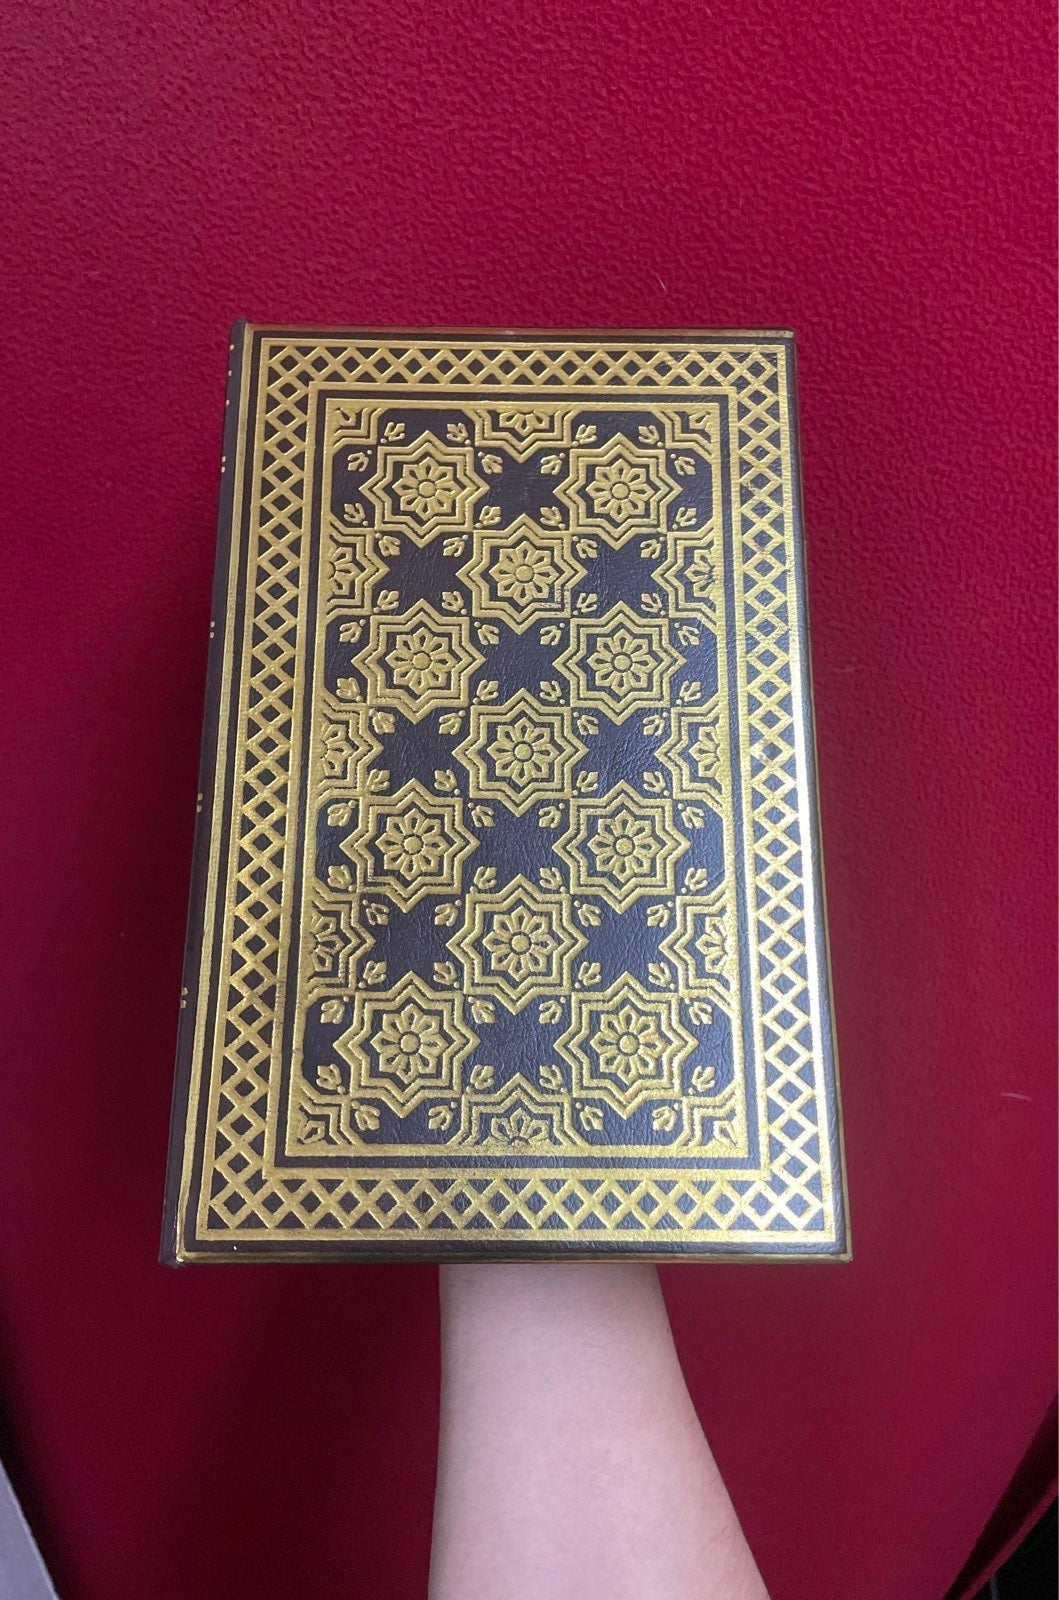 Stash book